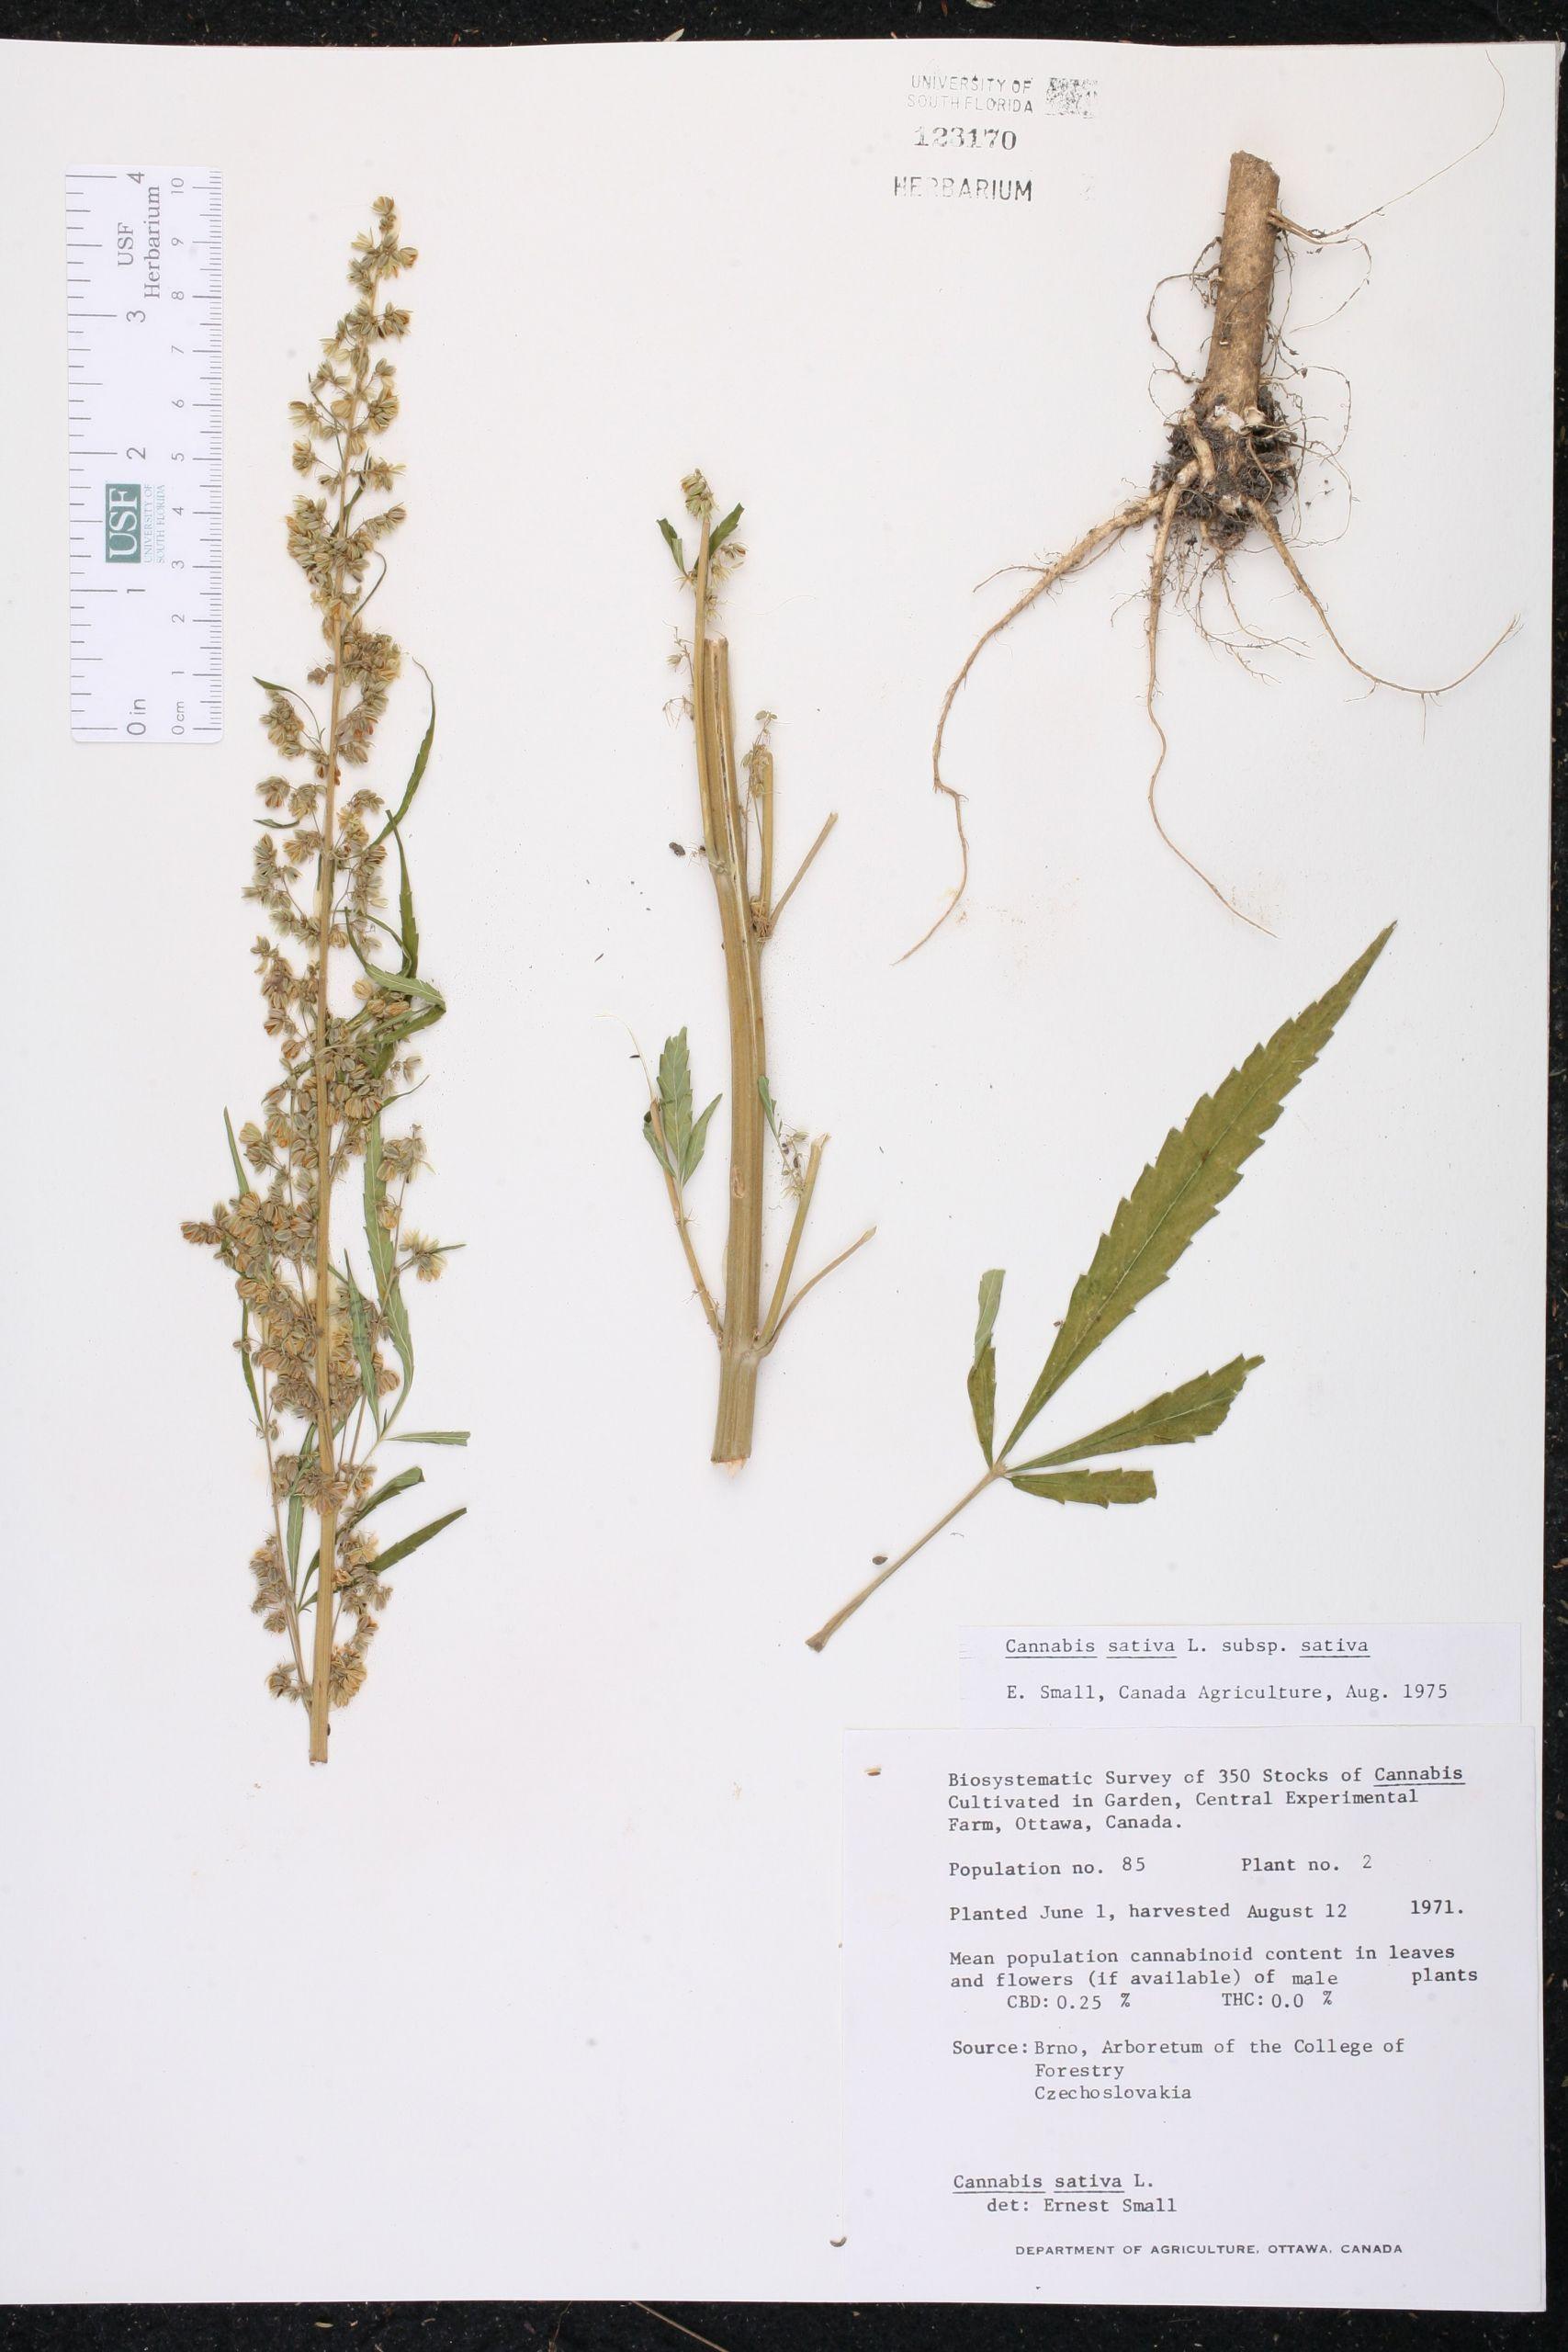 Avis Habitat Et Jardin Luxe Cannabis Sativa Species Page isb atlas Of Florida Plants Of 36 Inspirant Avis Habitat Et Jardin